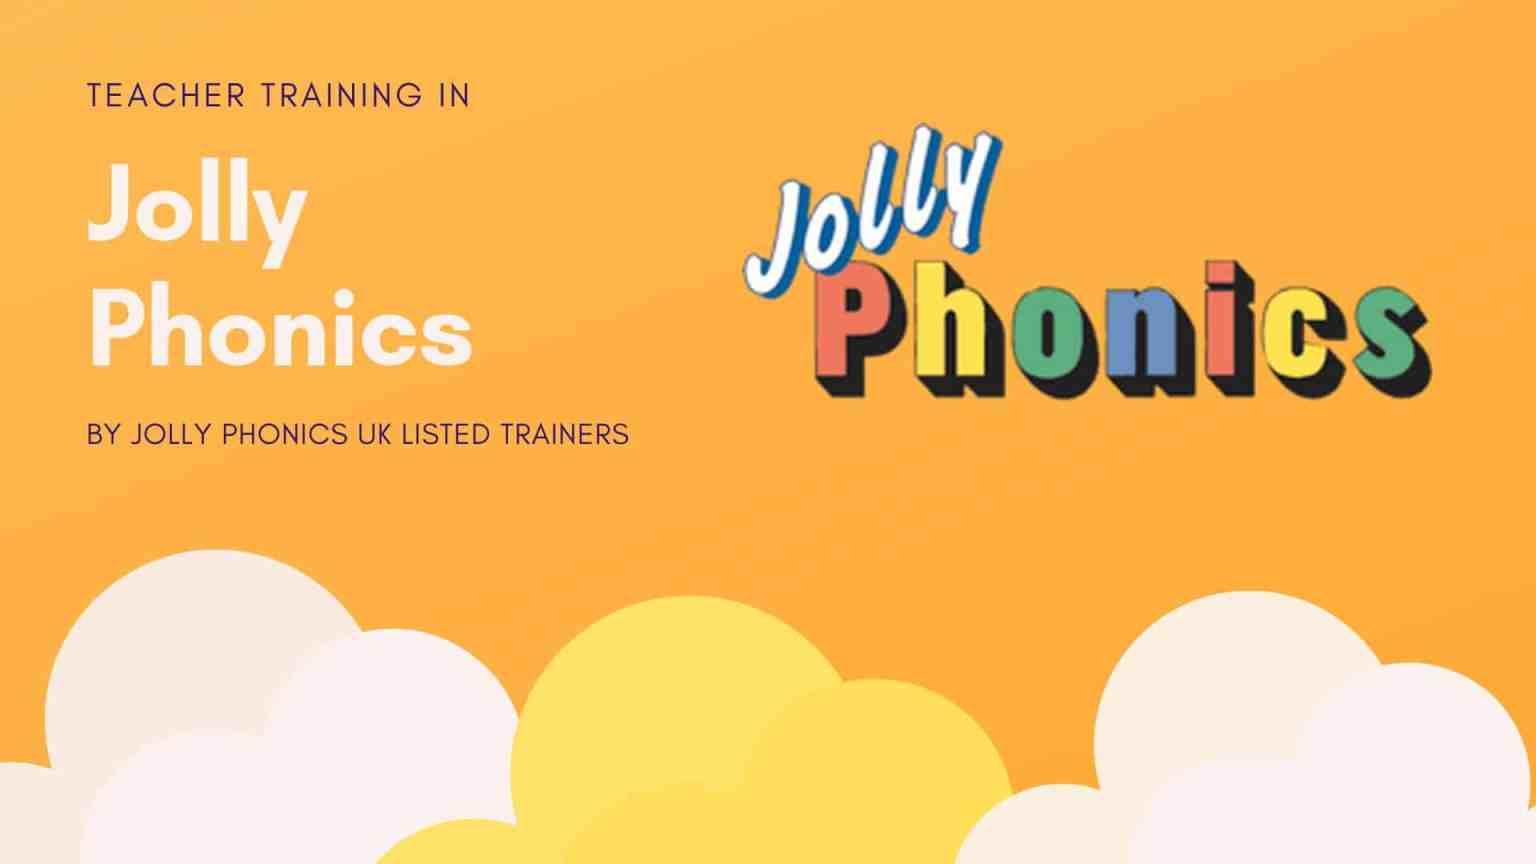 Training in Jolly Phonics